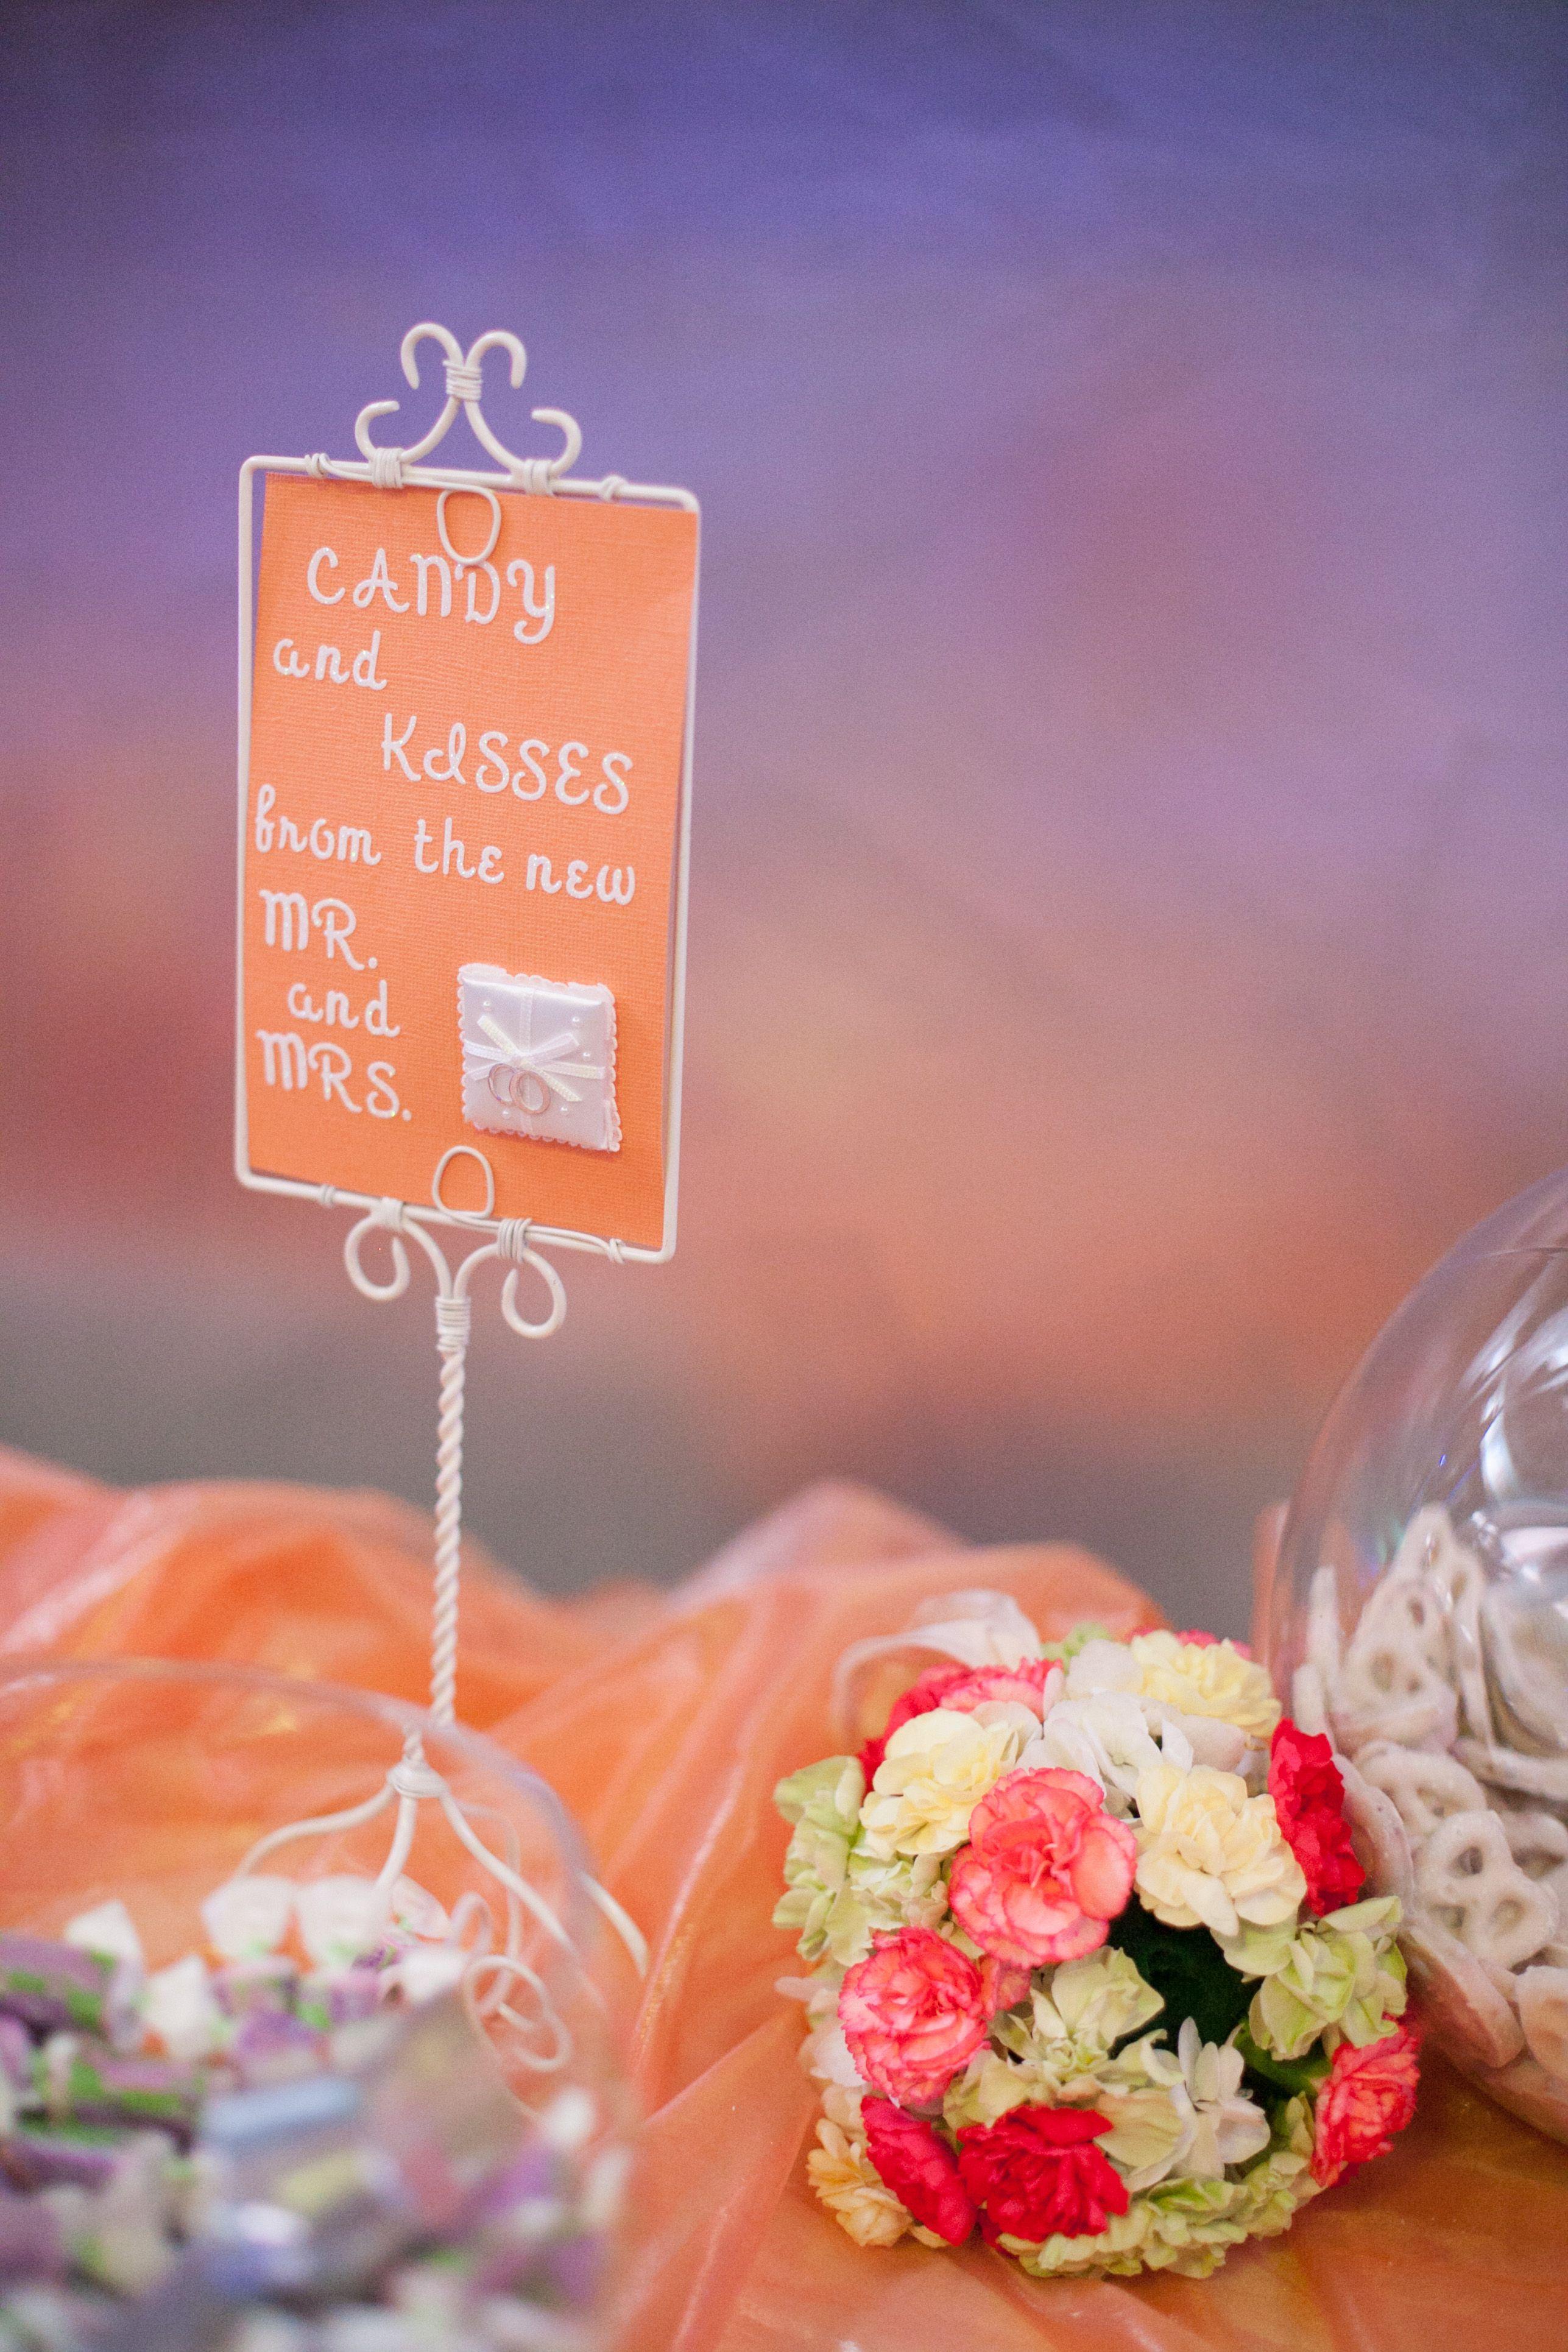 Candy Buffet Sign - Simply Adorable | A\'BULAE Weddings | Pinterest ...